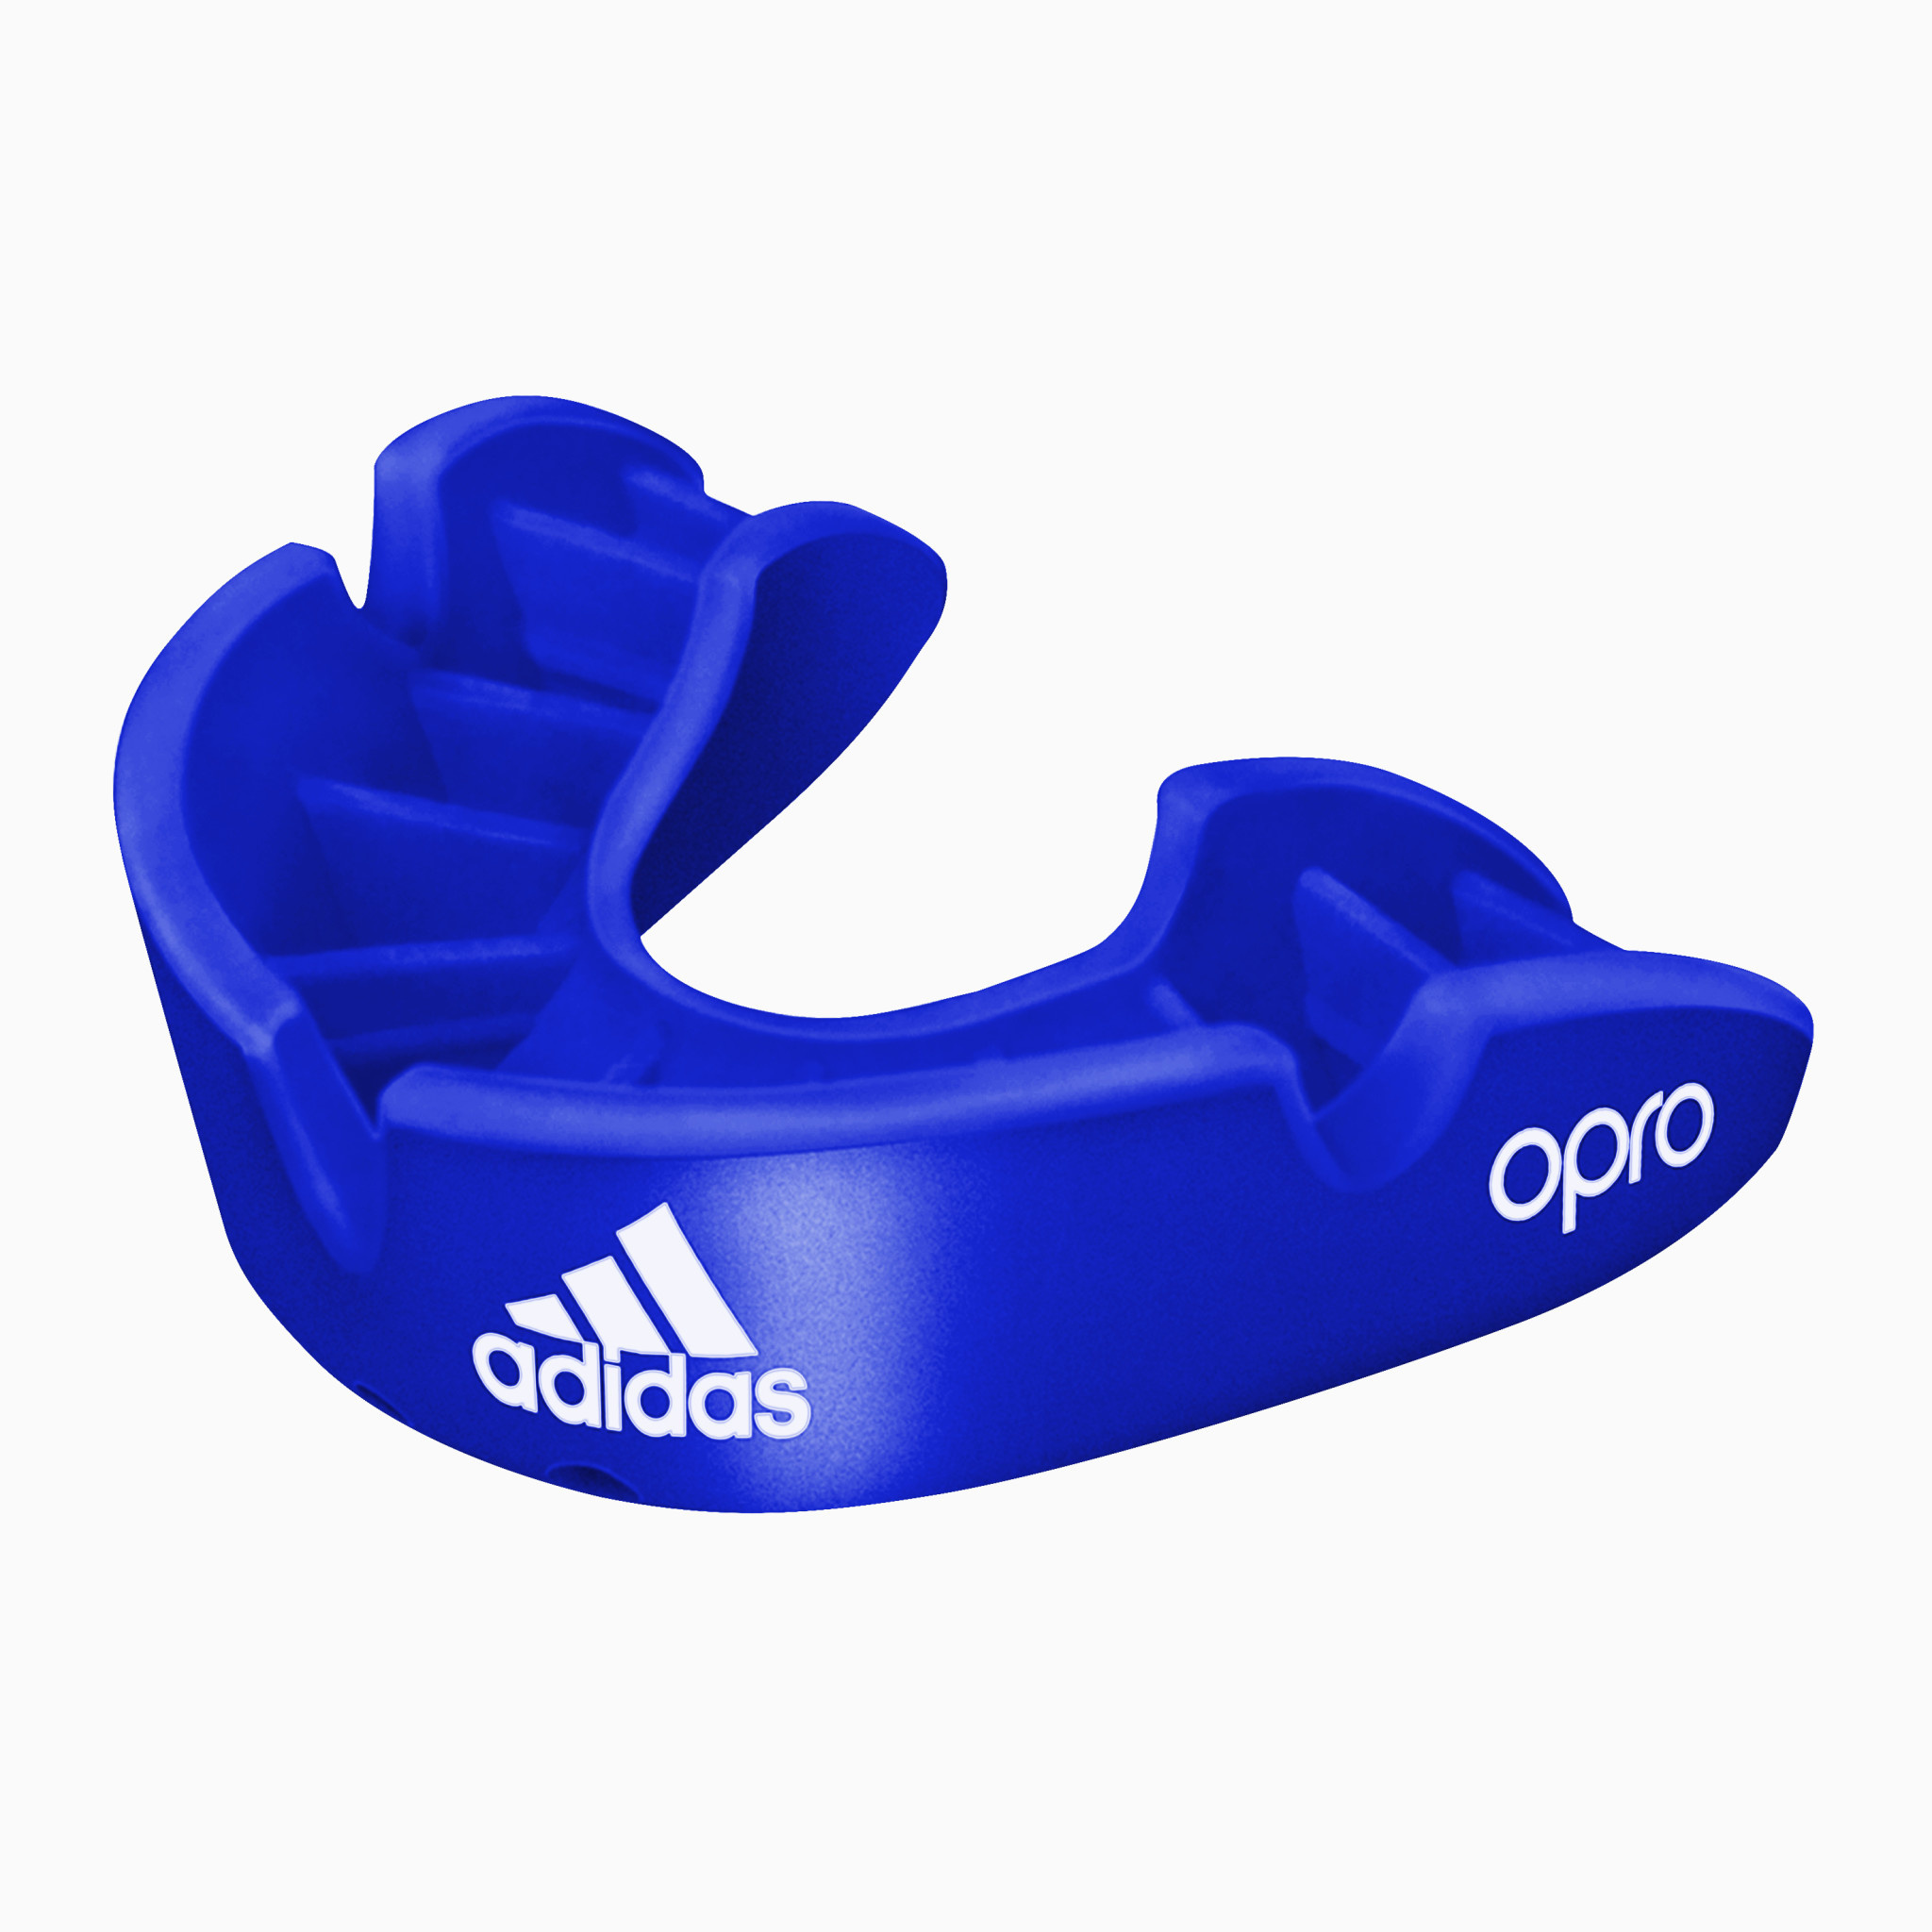 Adidas Adidas mouthguard brons blauw